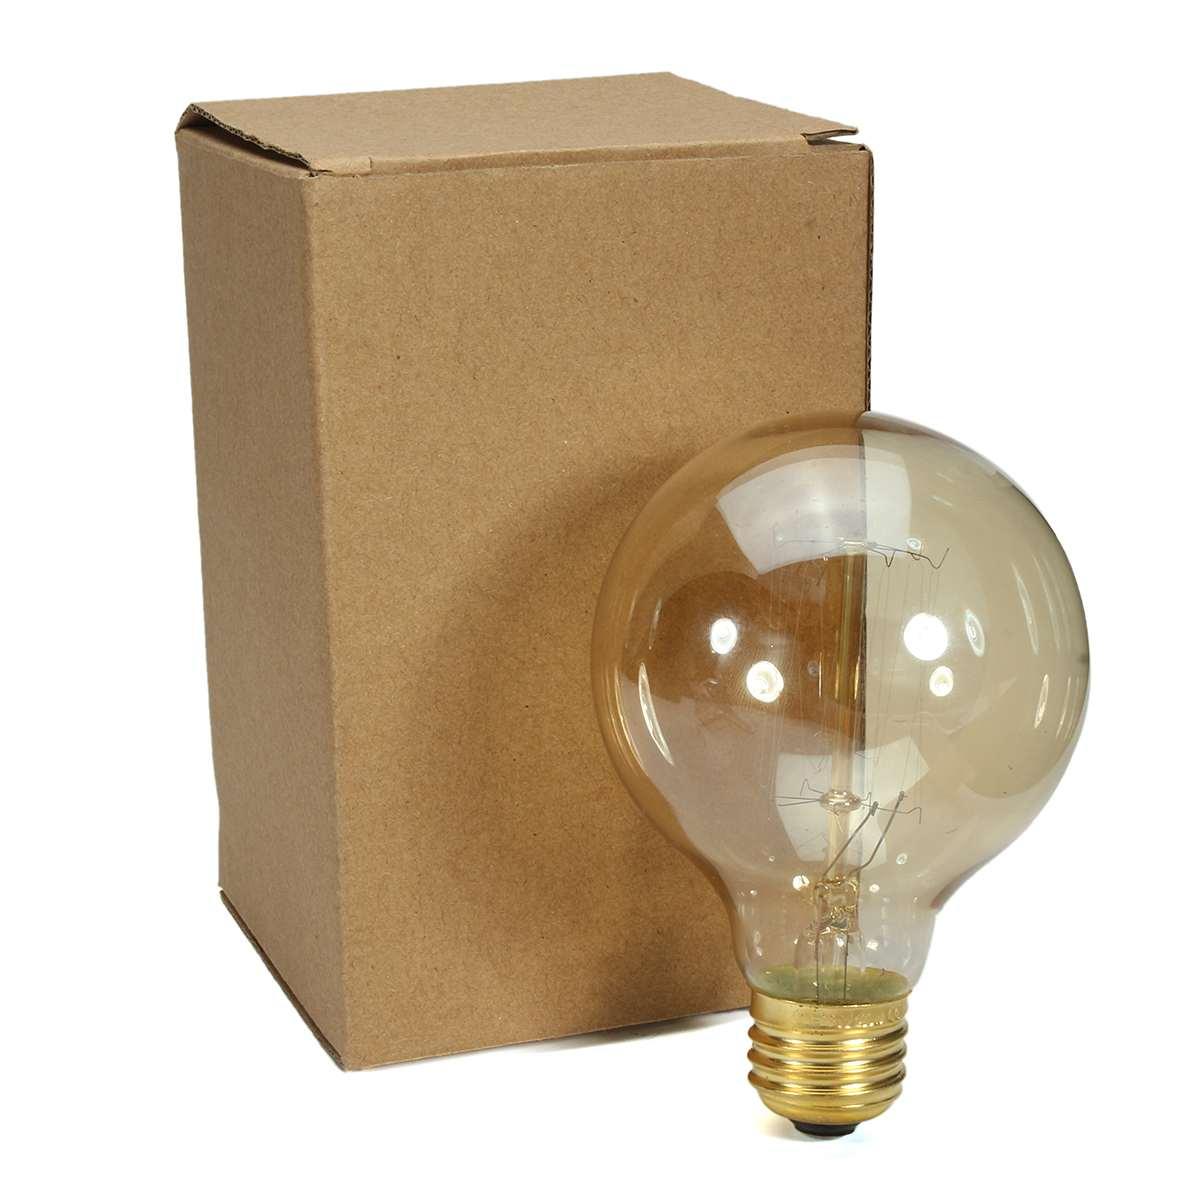 40W Edison Bulbs Vintage Style Incandescent Light Bulb Dimmable E14 Base Retro Lighting